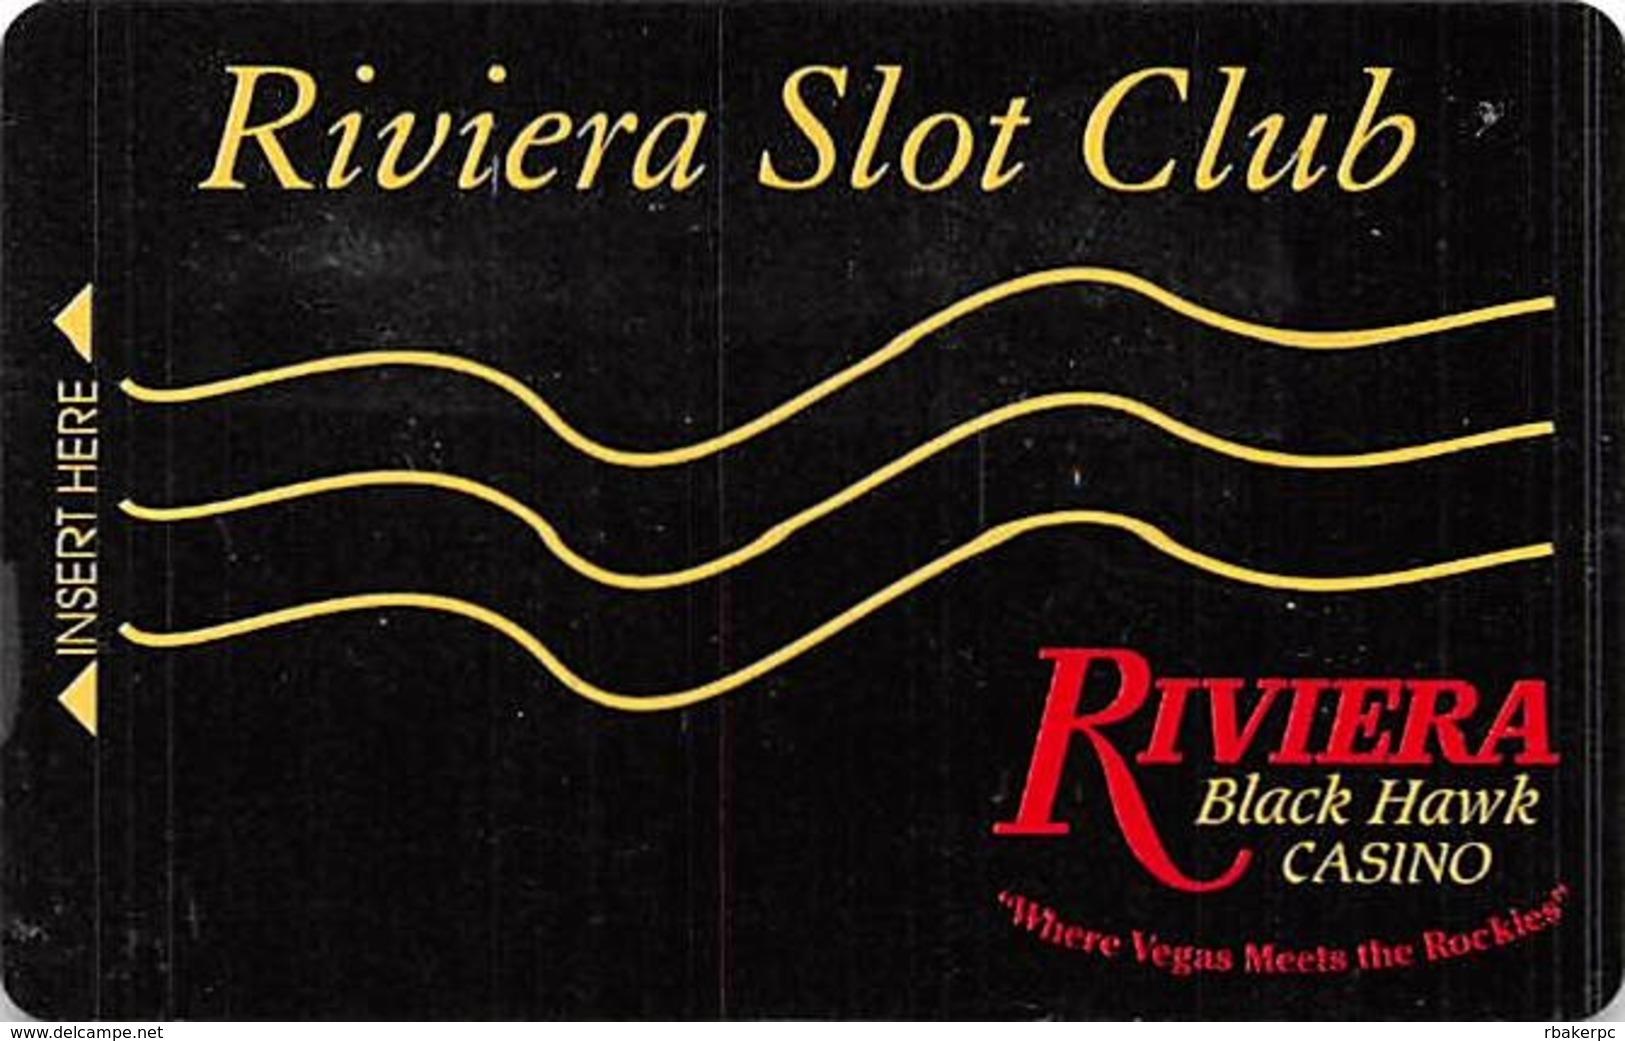 Riviera Casino - Black Hawk CO - BLANK 1st Issue Slot Card W/Signature Strip - Casino Cards